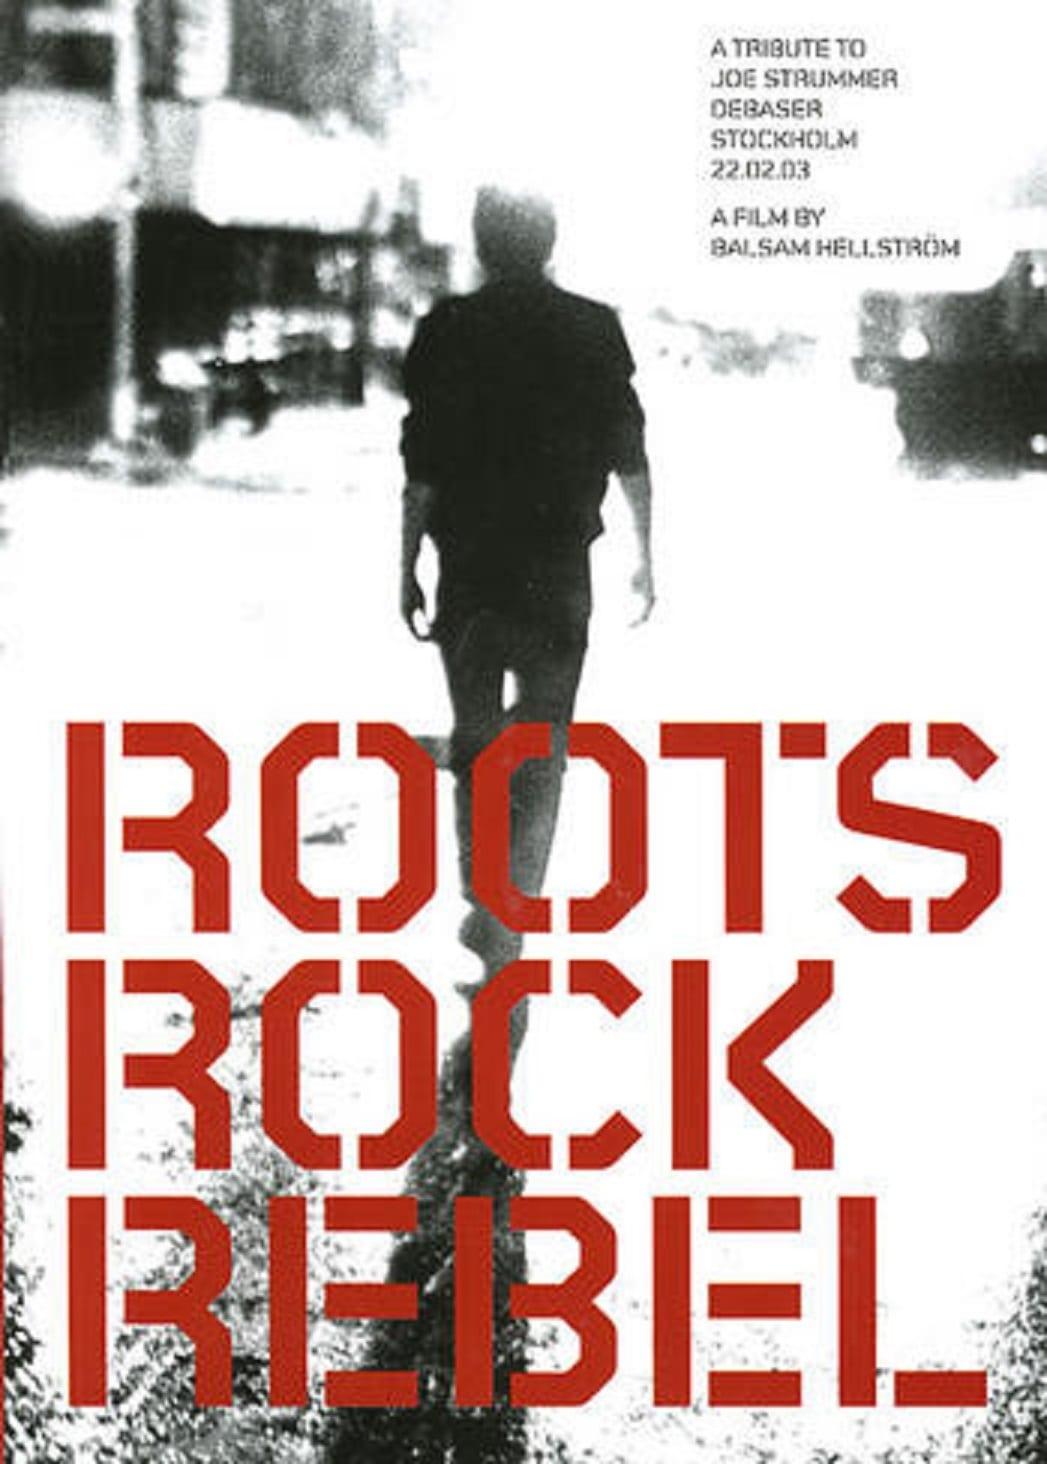 Rock Roots Rebel: A Tribute to Joe Strummer